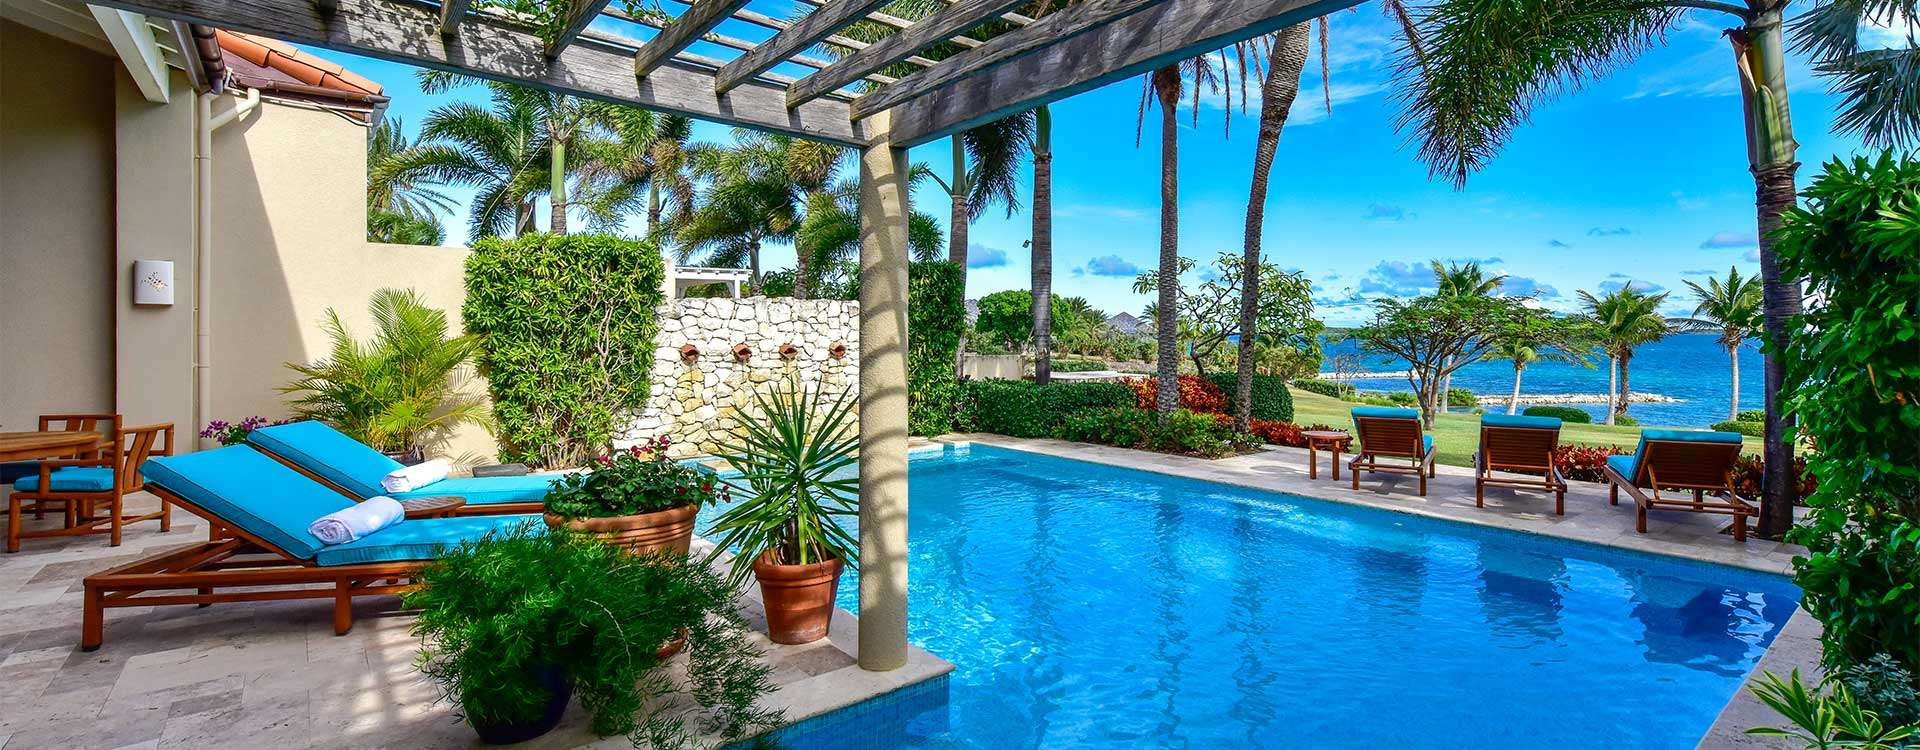 Luxury villa rentals caribbean - Antigua - Jumby bay island - No location 4 - Banyan - Image 1/6